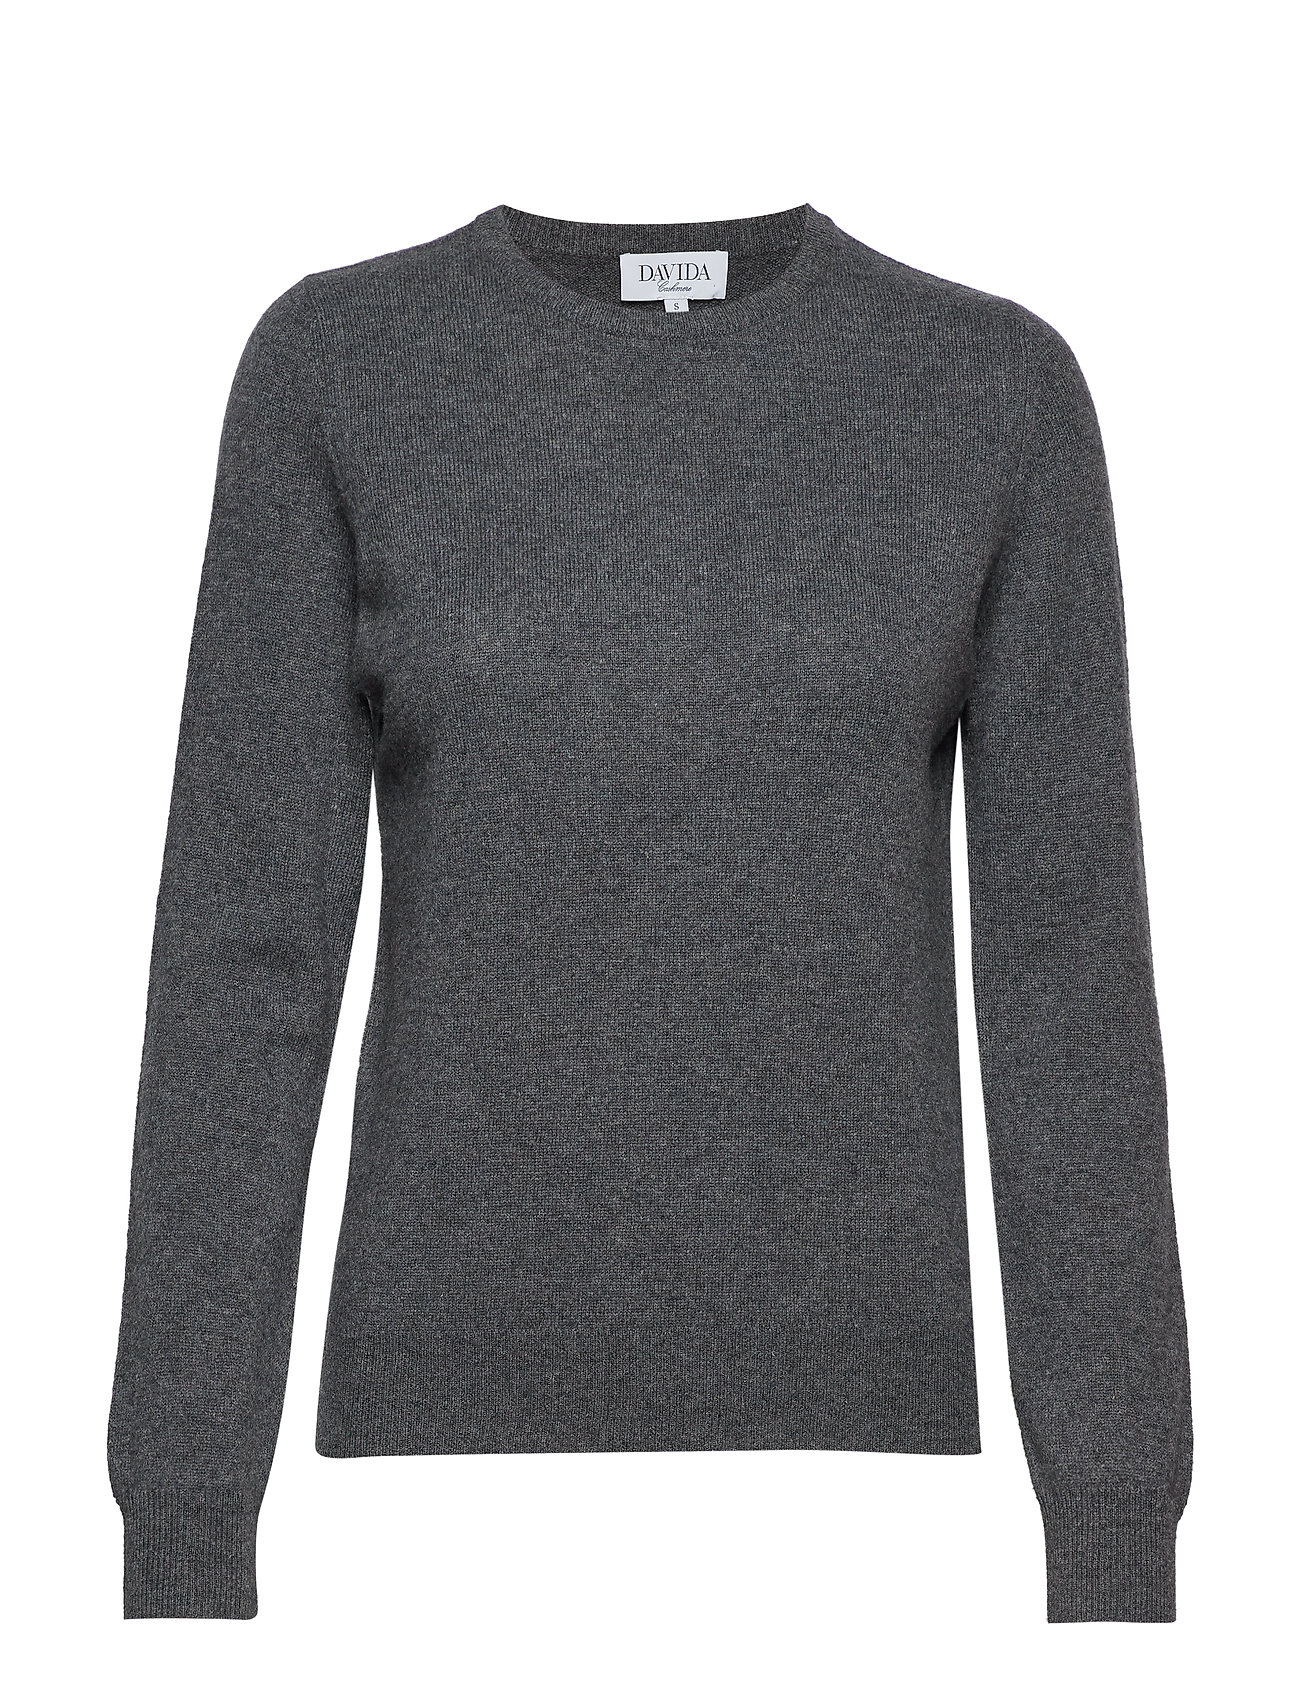 Davida Cashmere Basic sweater - DARK GREY